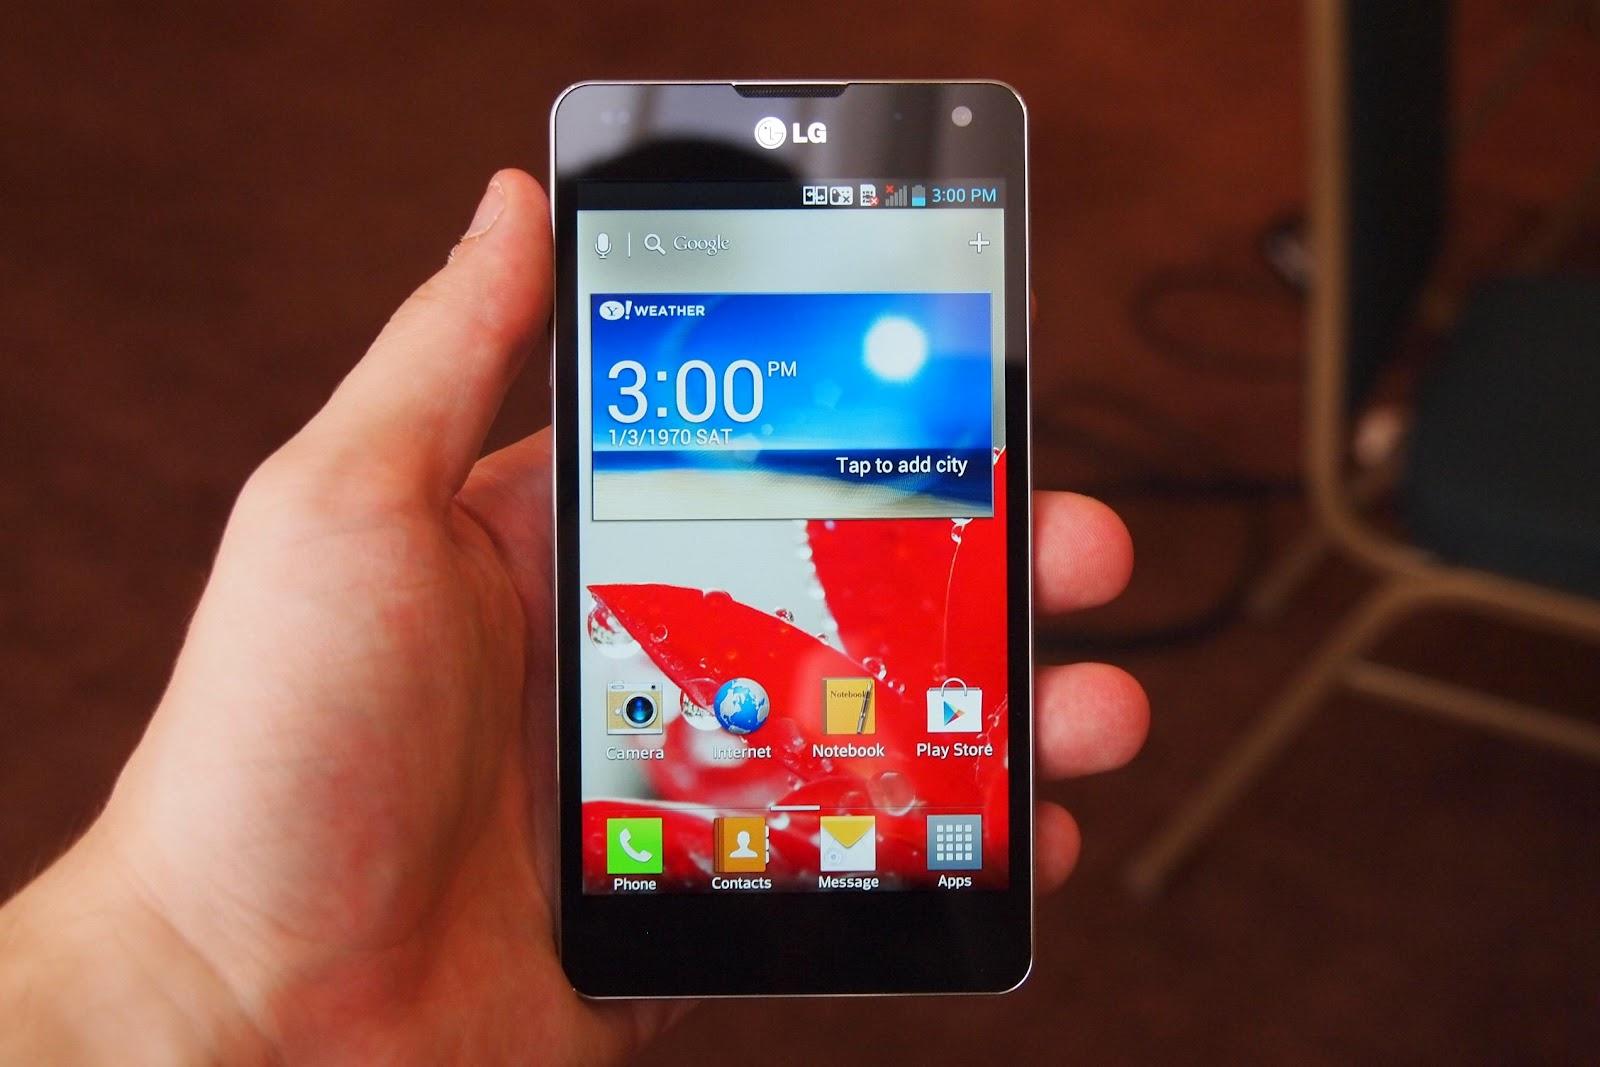 http://1.bp.blogspot.com/-ZkiJzyHbQoY/UG5b3e_oZ3I/AAAAAAAAKEk/GDa8DJ-vHnU/s1600/LG+Optimus+G+Nexus15.jpg